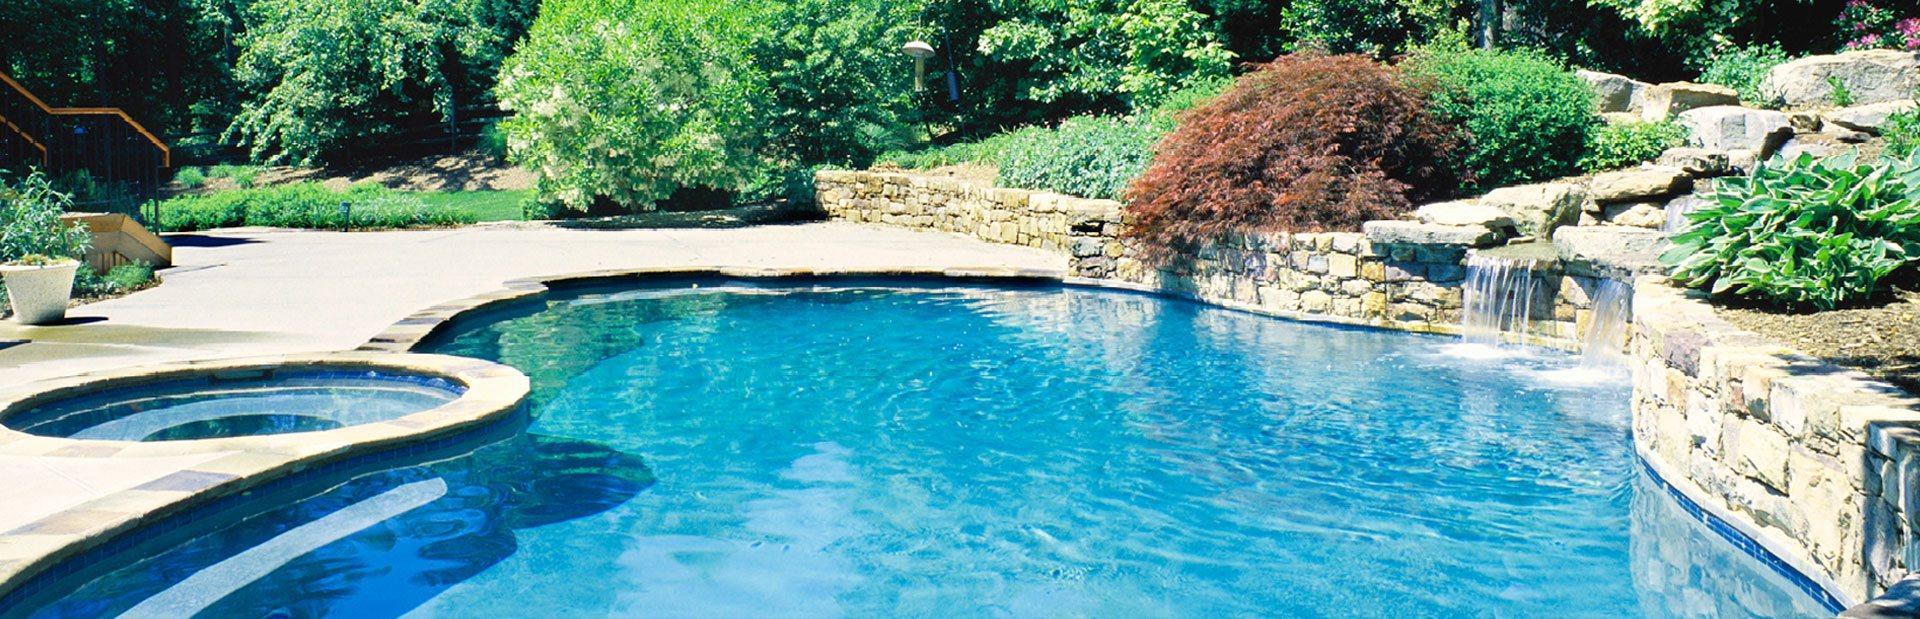 Paradise Pool Pearl Ms Shapeyourminds Com